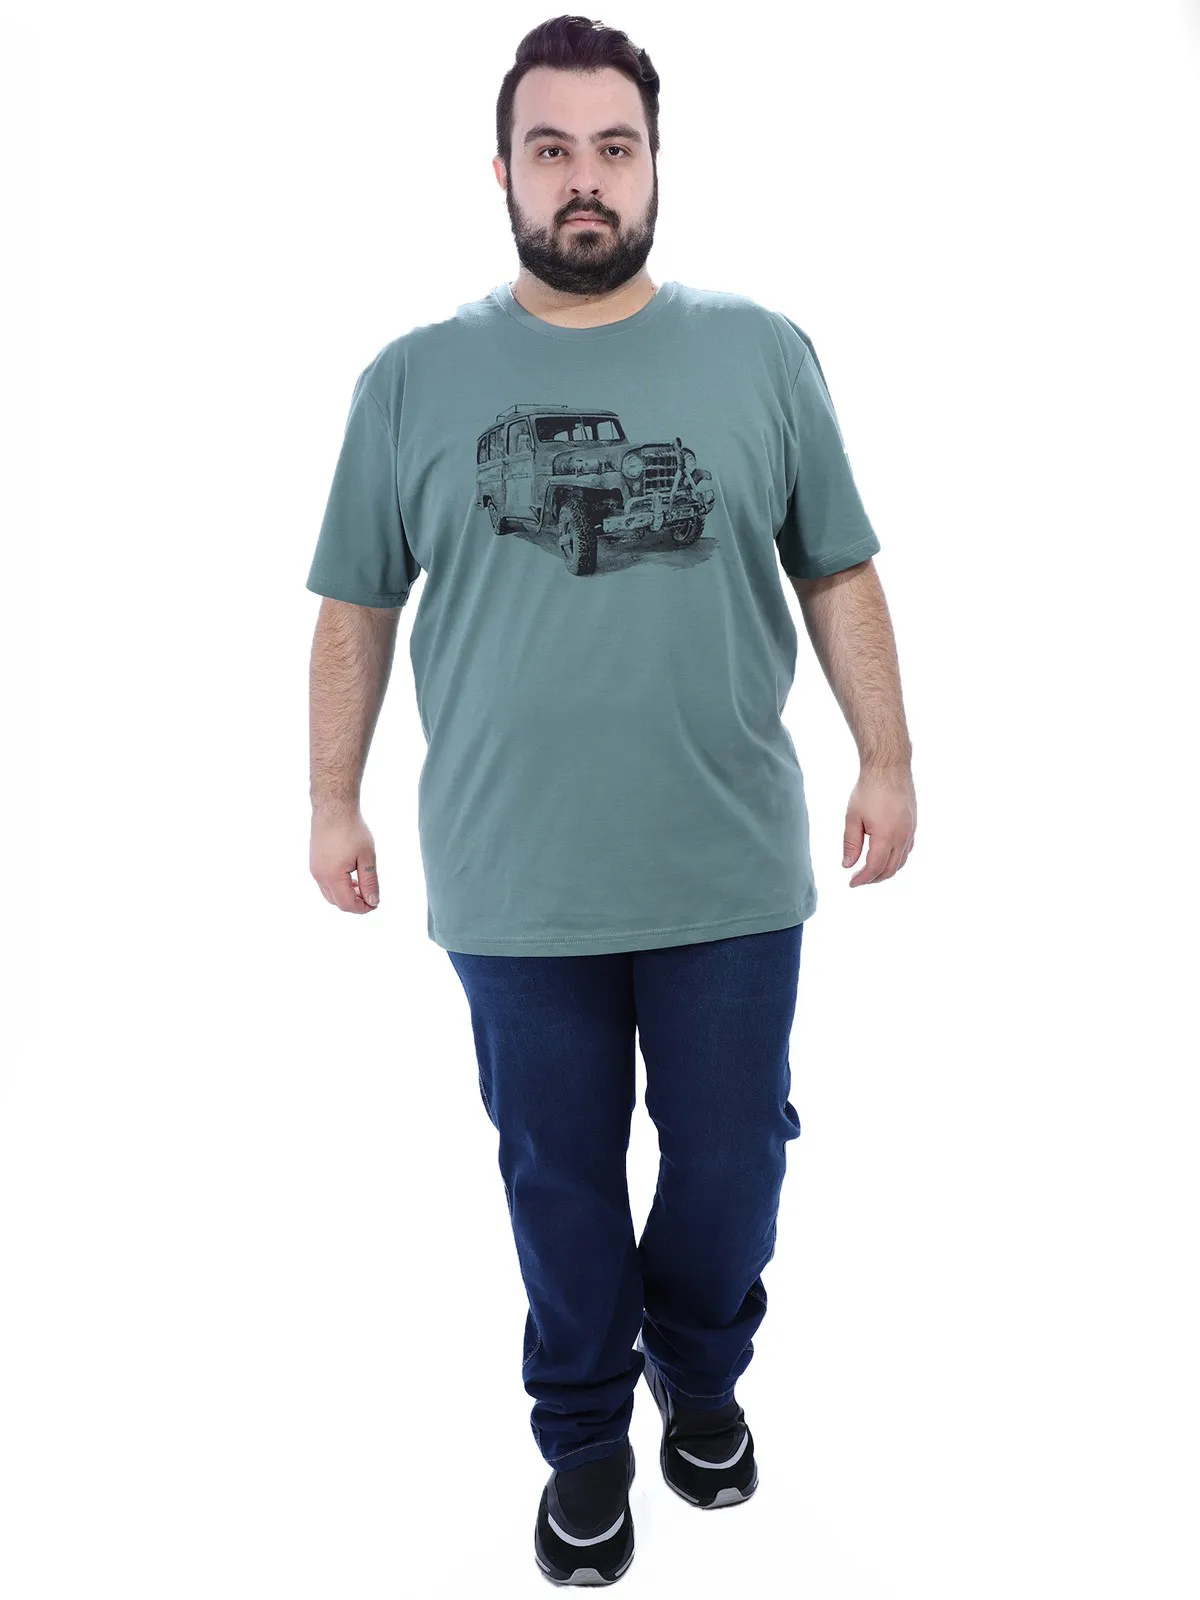 Camiseta Plus Size Masculino Manga Curta Estampa Jeep Concreto